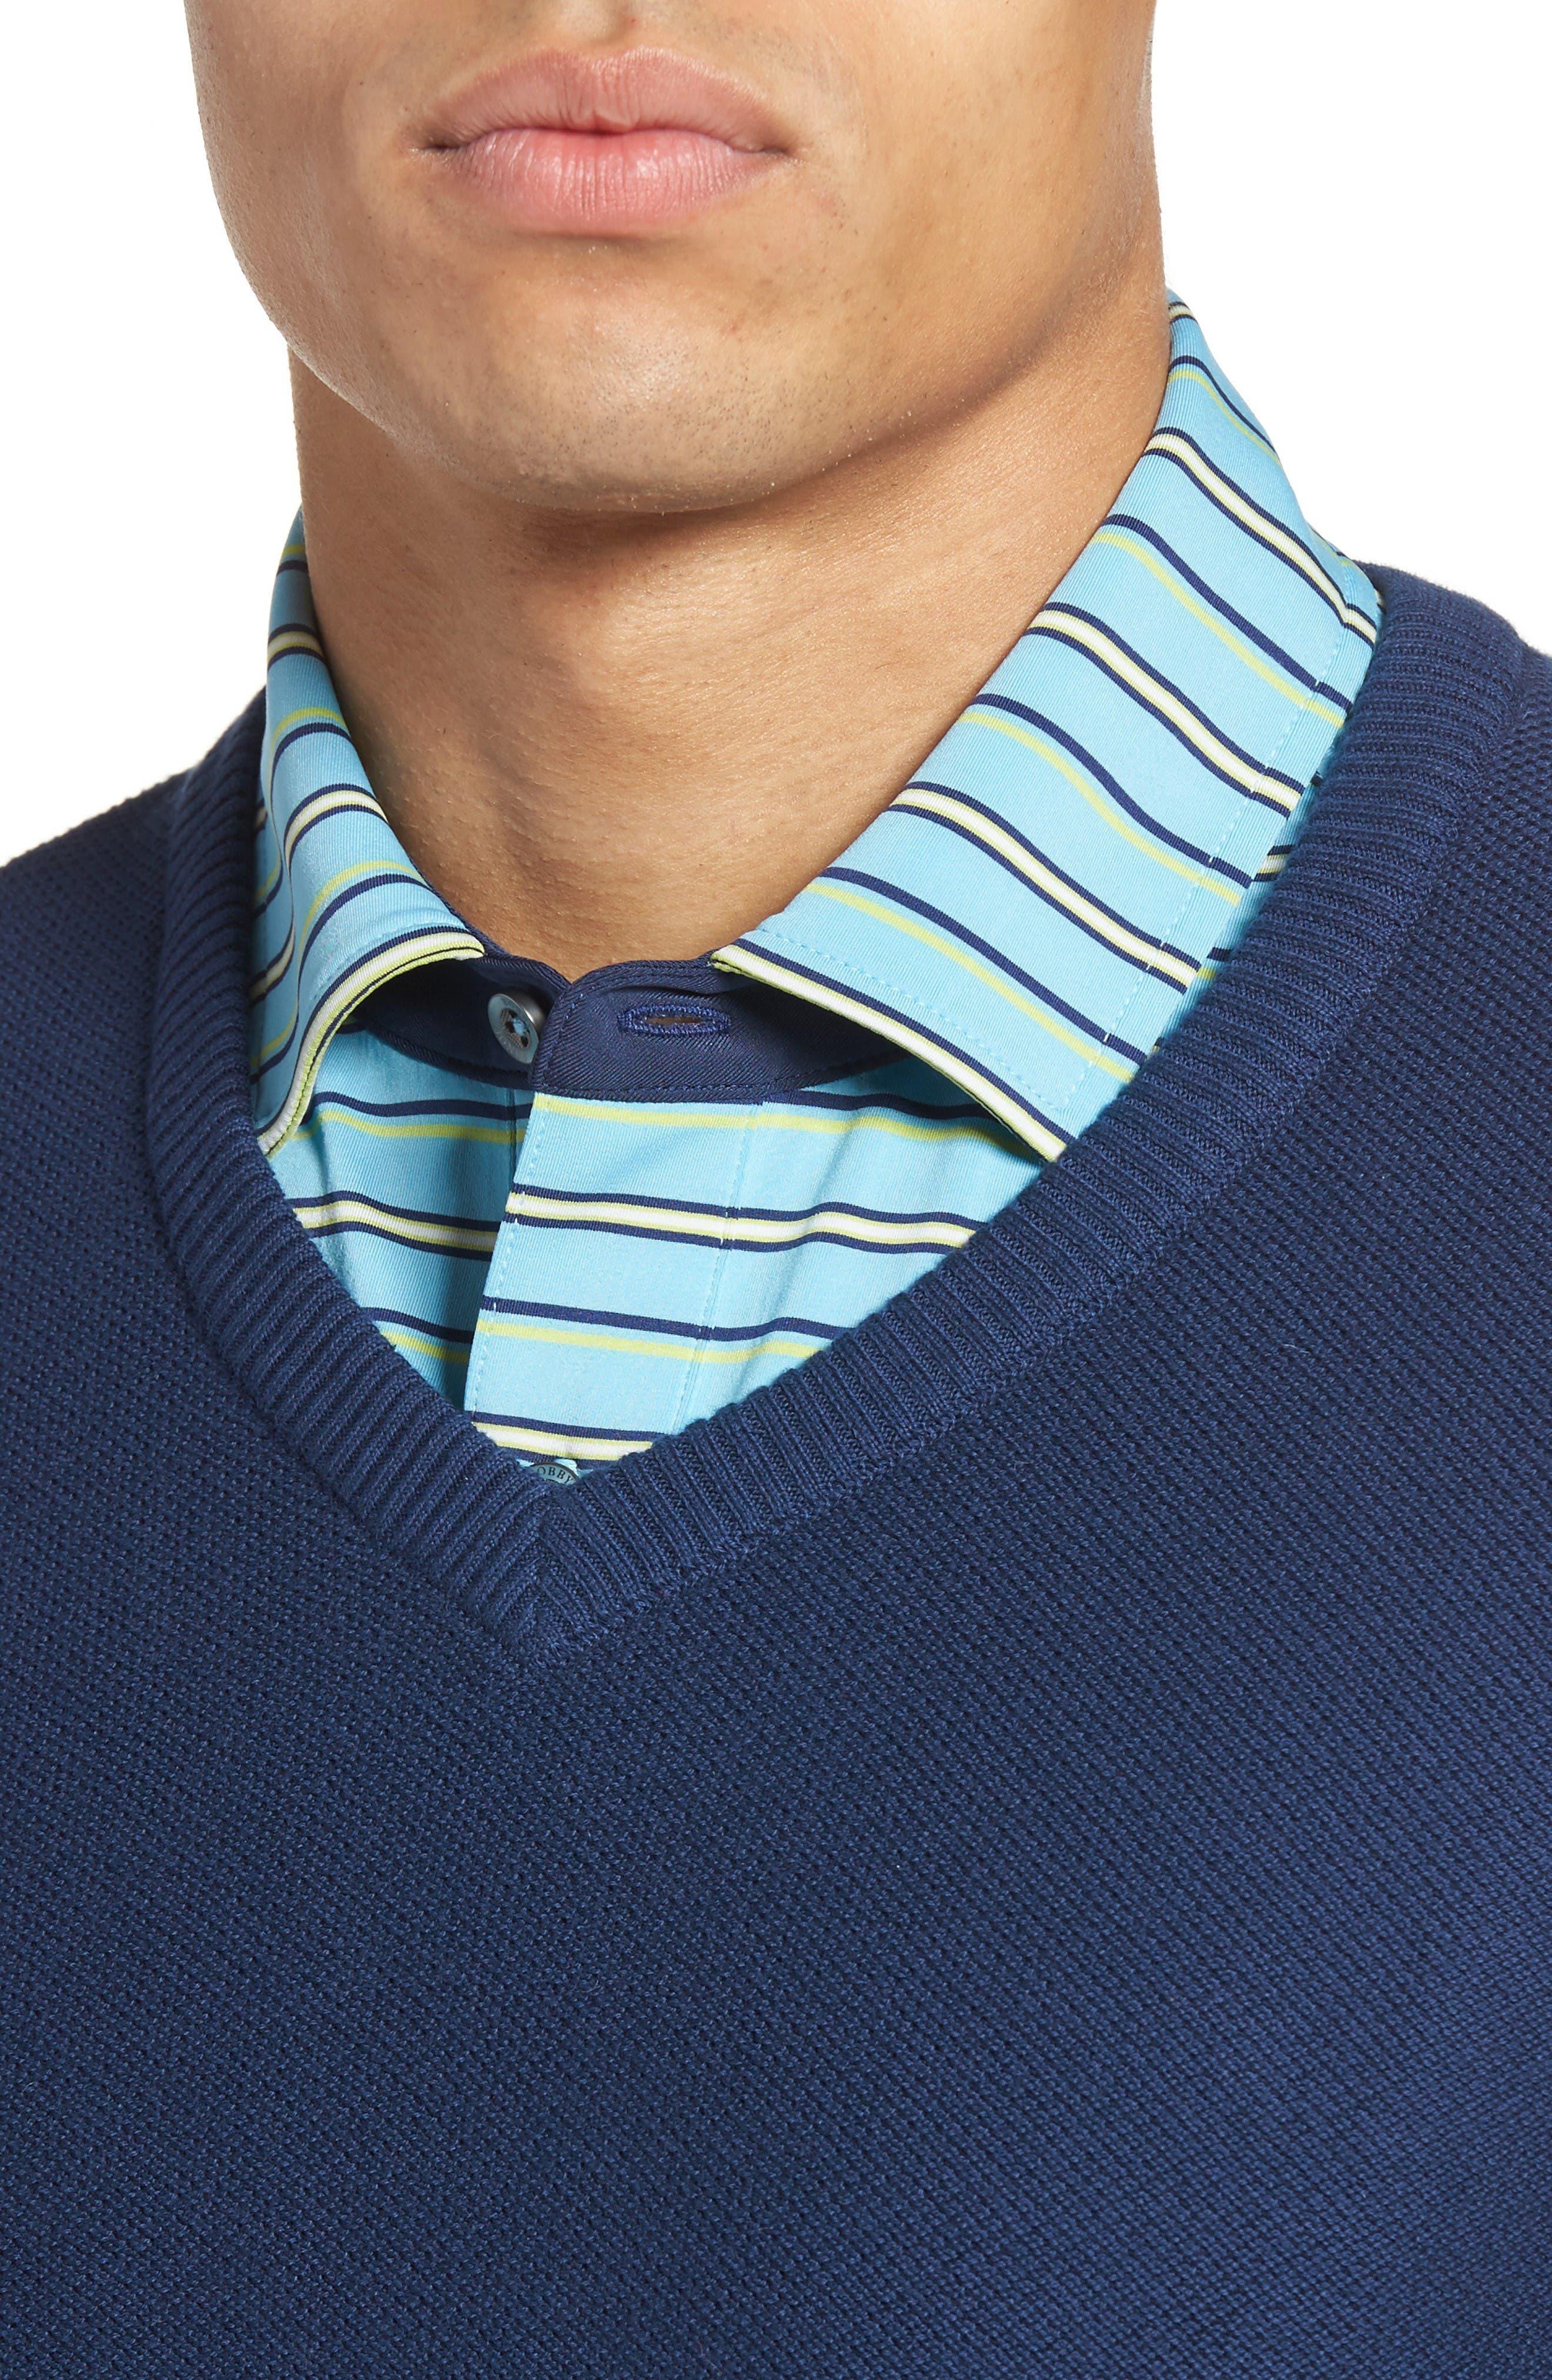 Piqué Jersey V-Neck Sweater,                             Alternate thumbnail 4, color,                             Summer Navy